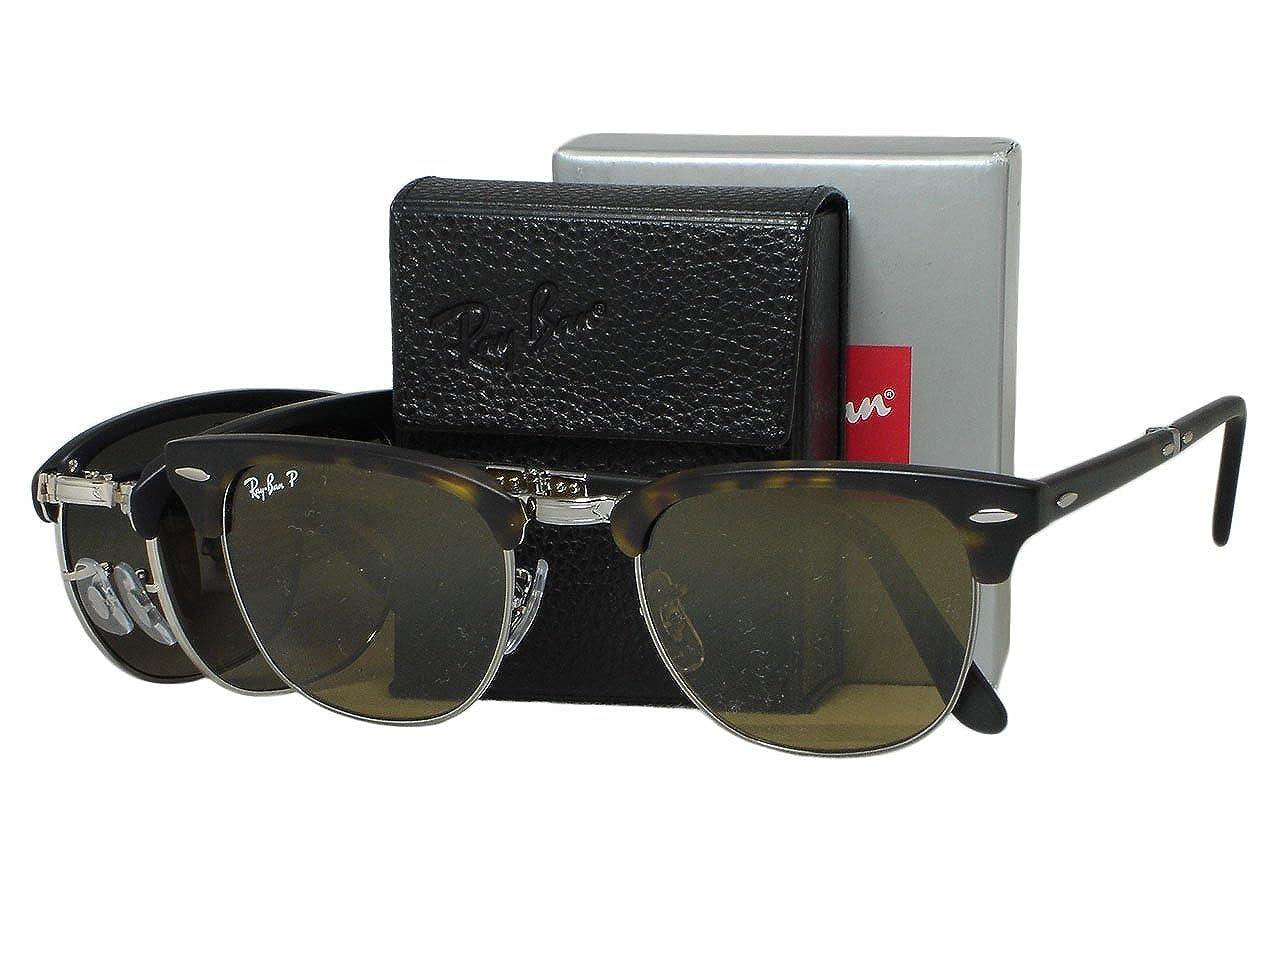 3f2b5ff96d Ray Ban RB2176 Folding Clubmaster 1151 M7 Matte Havana Polarized Sunglasses  51mm  Amazon.ca  Clothing   Accessories